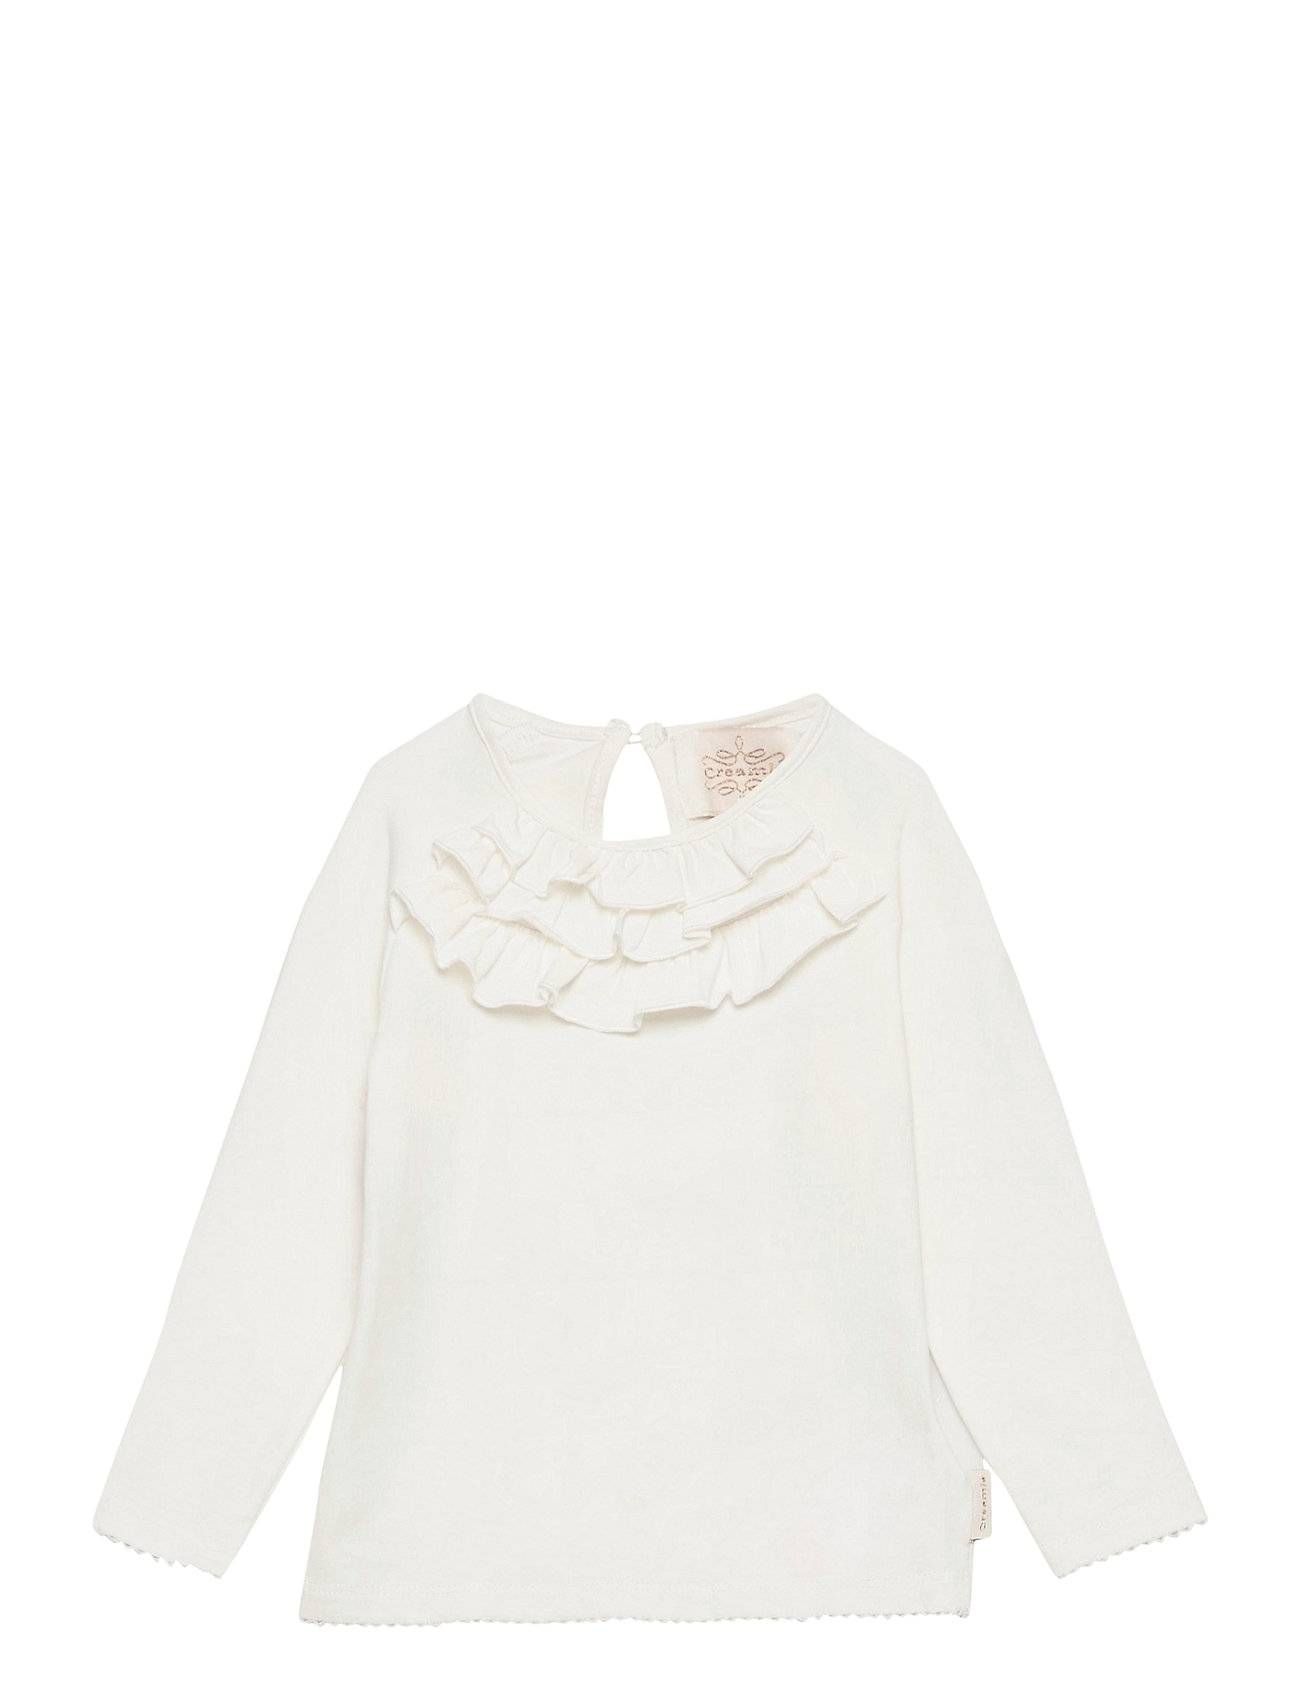 Creamie T-Shirt Ruffle Ls T-shirts Long-sleeved T-shirts Valkoinen Creamie